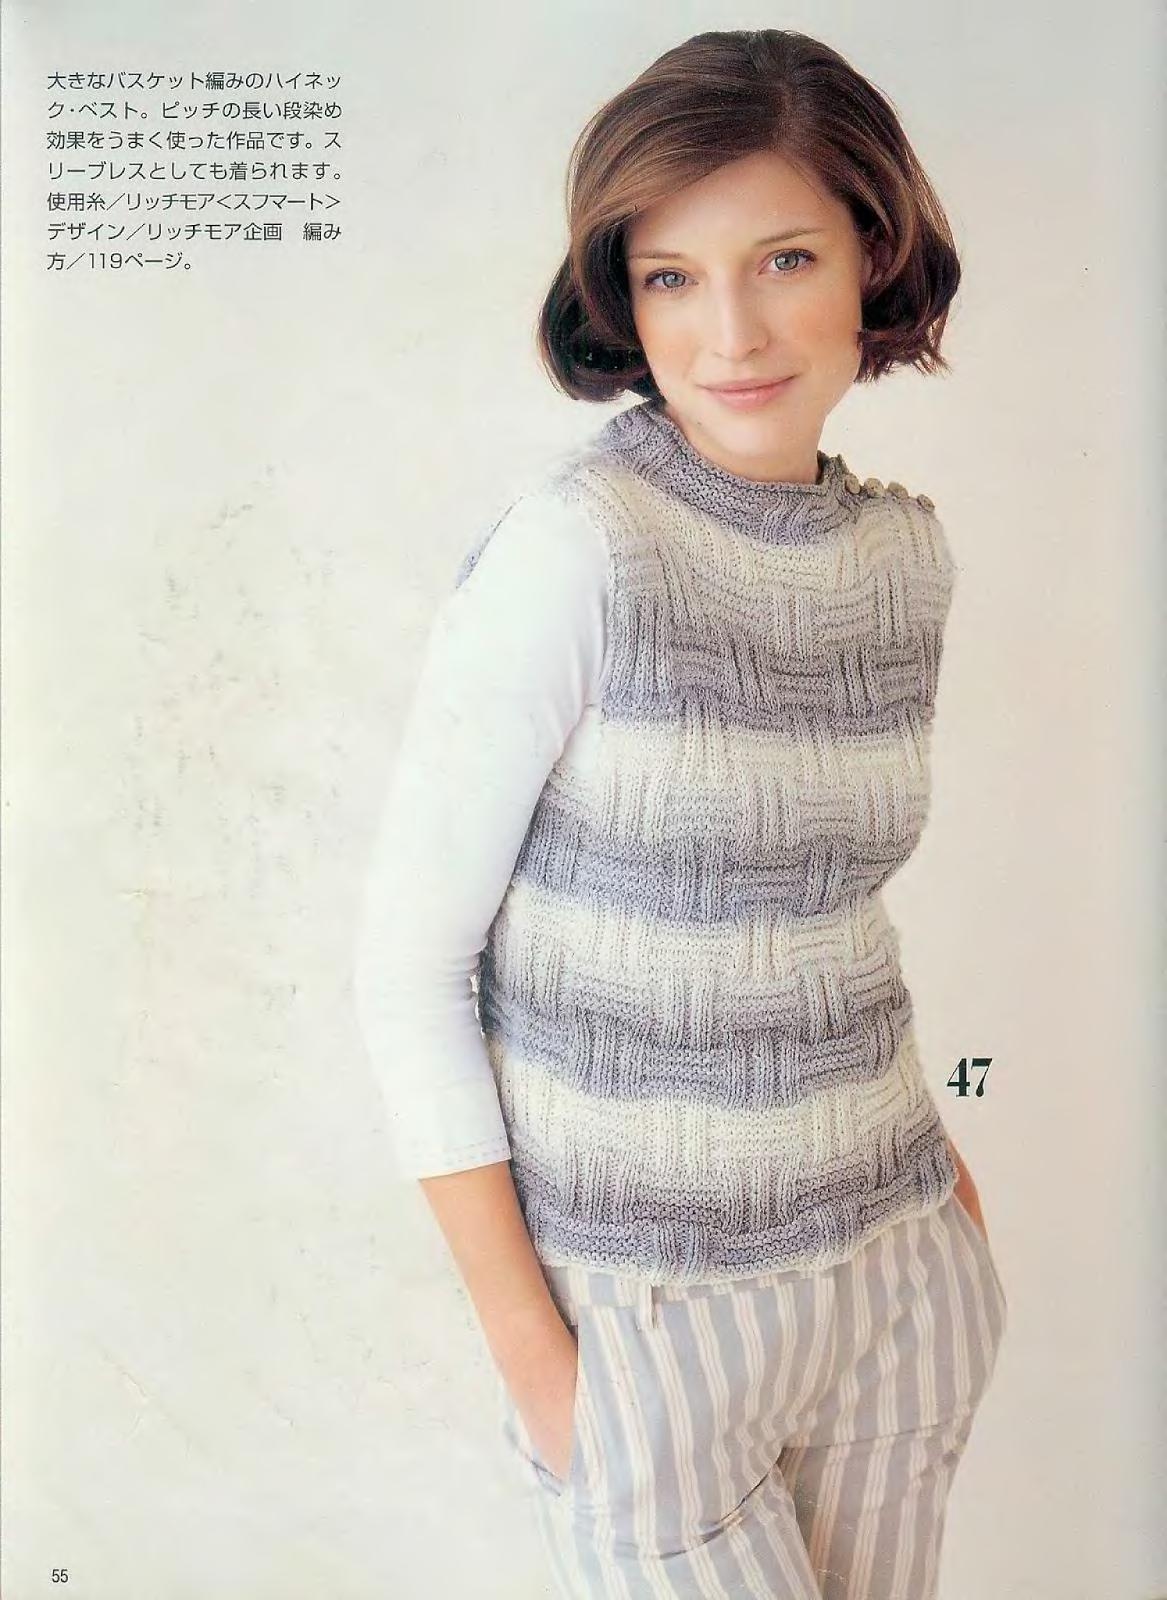 PSL handies free patterns: Simple woman vest knitting ...